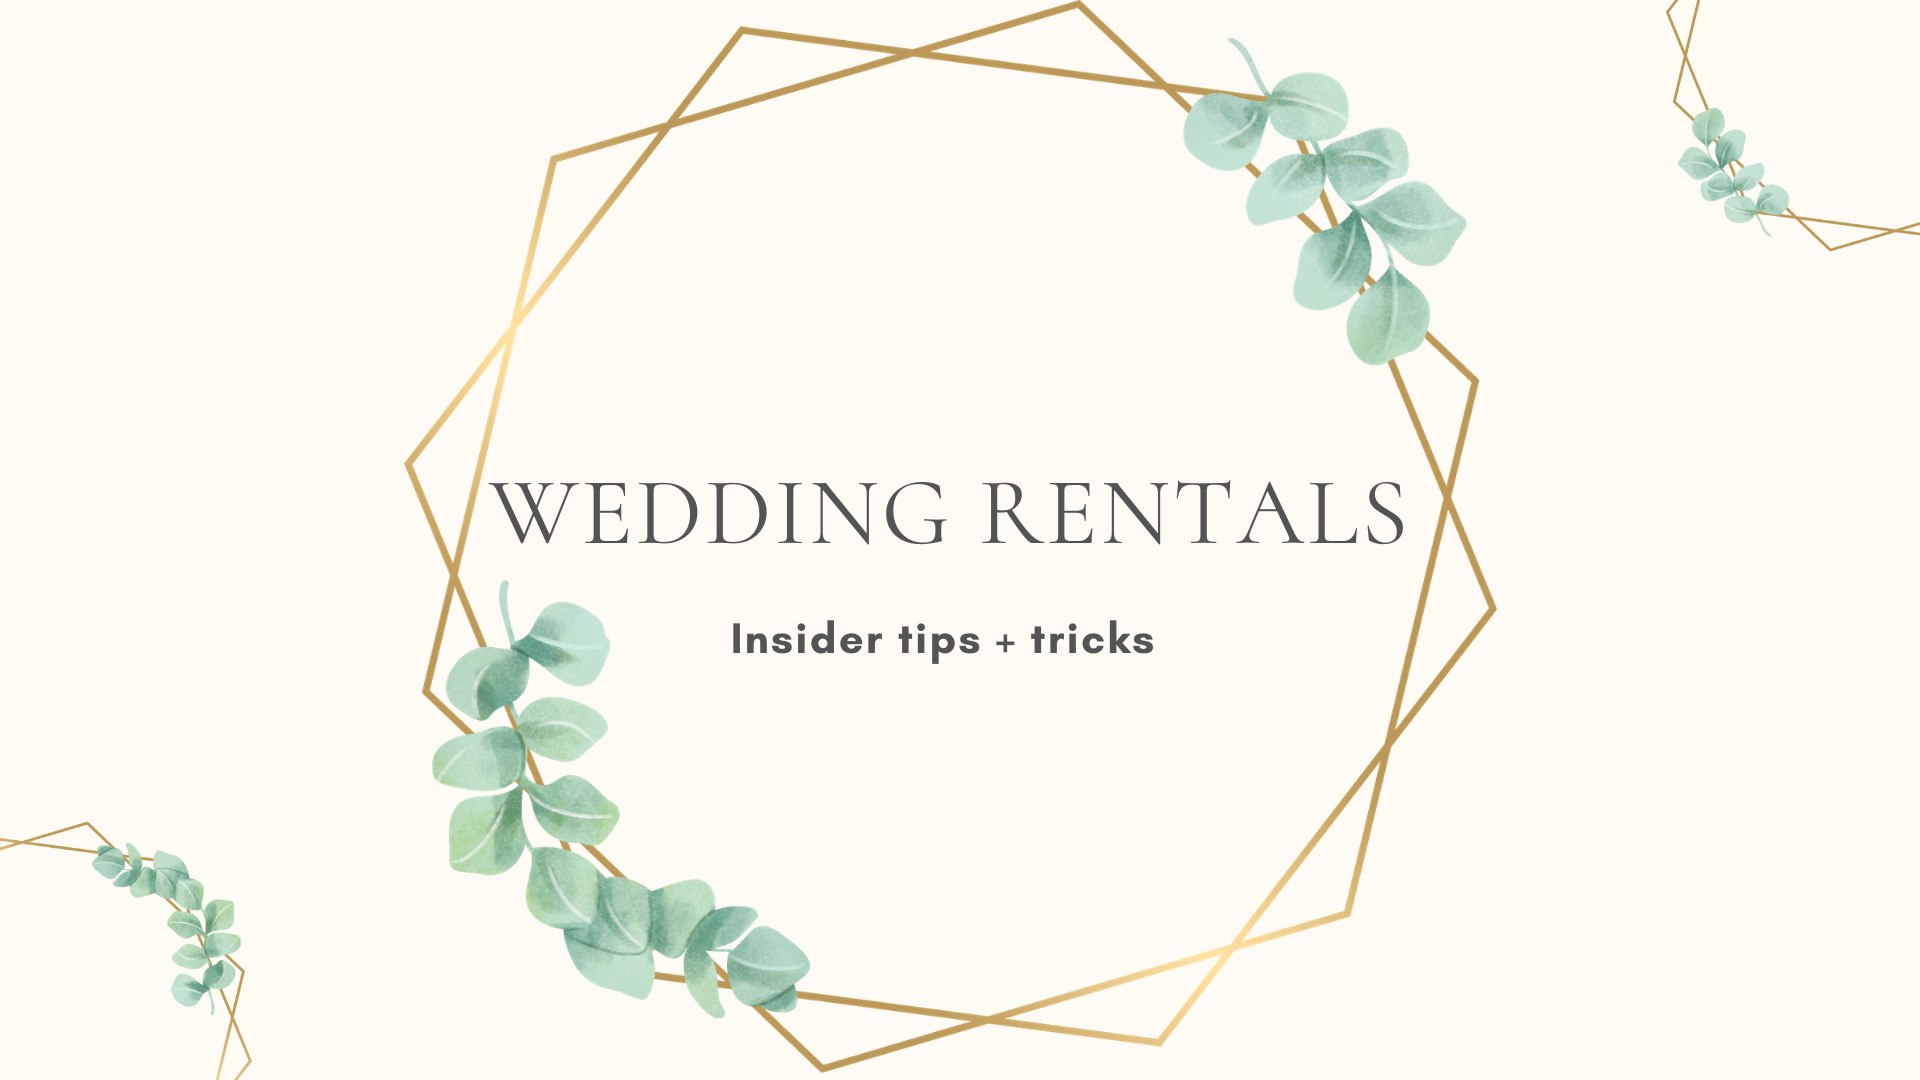 Wedding Rentals - Tips + Tricks